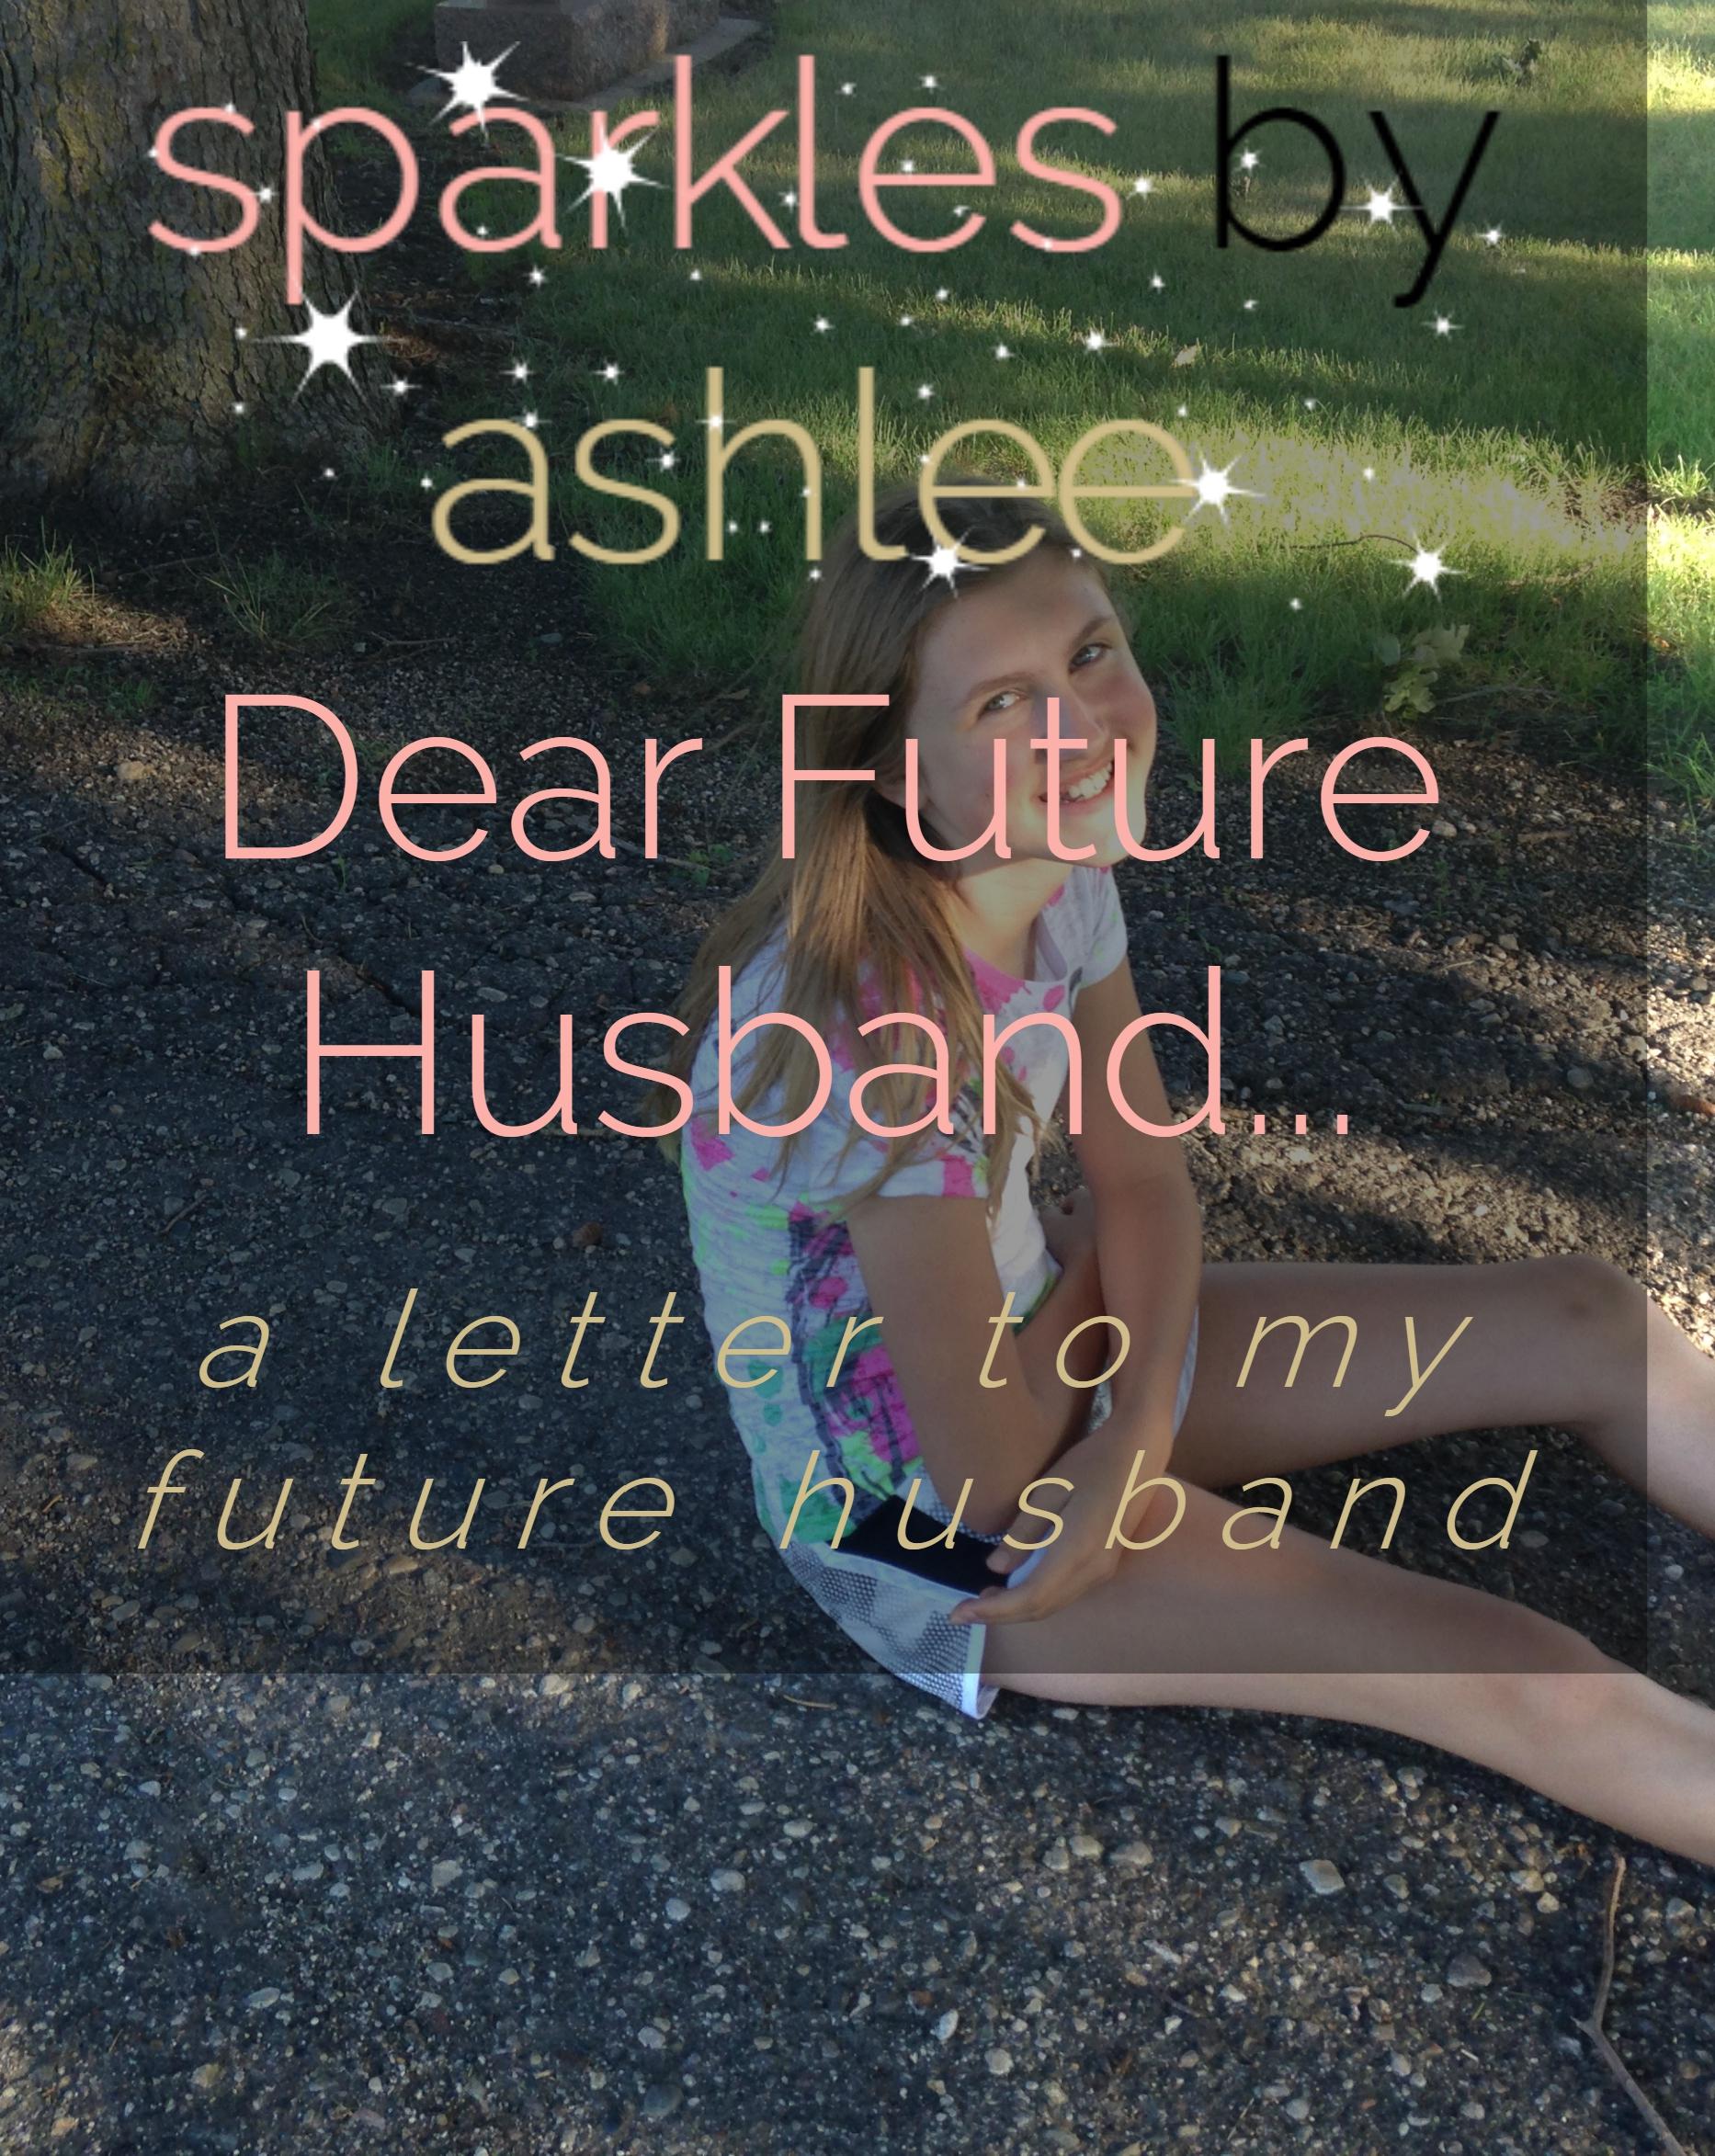 Dear-Future-Husband-Sparkles-by-Ashlee.jpg